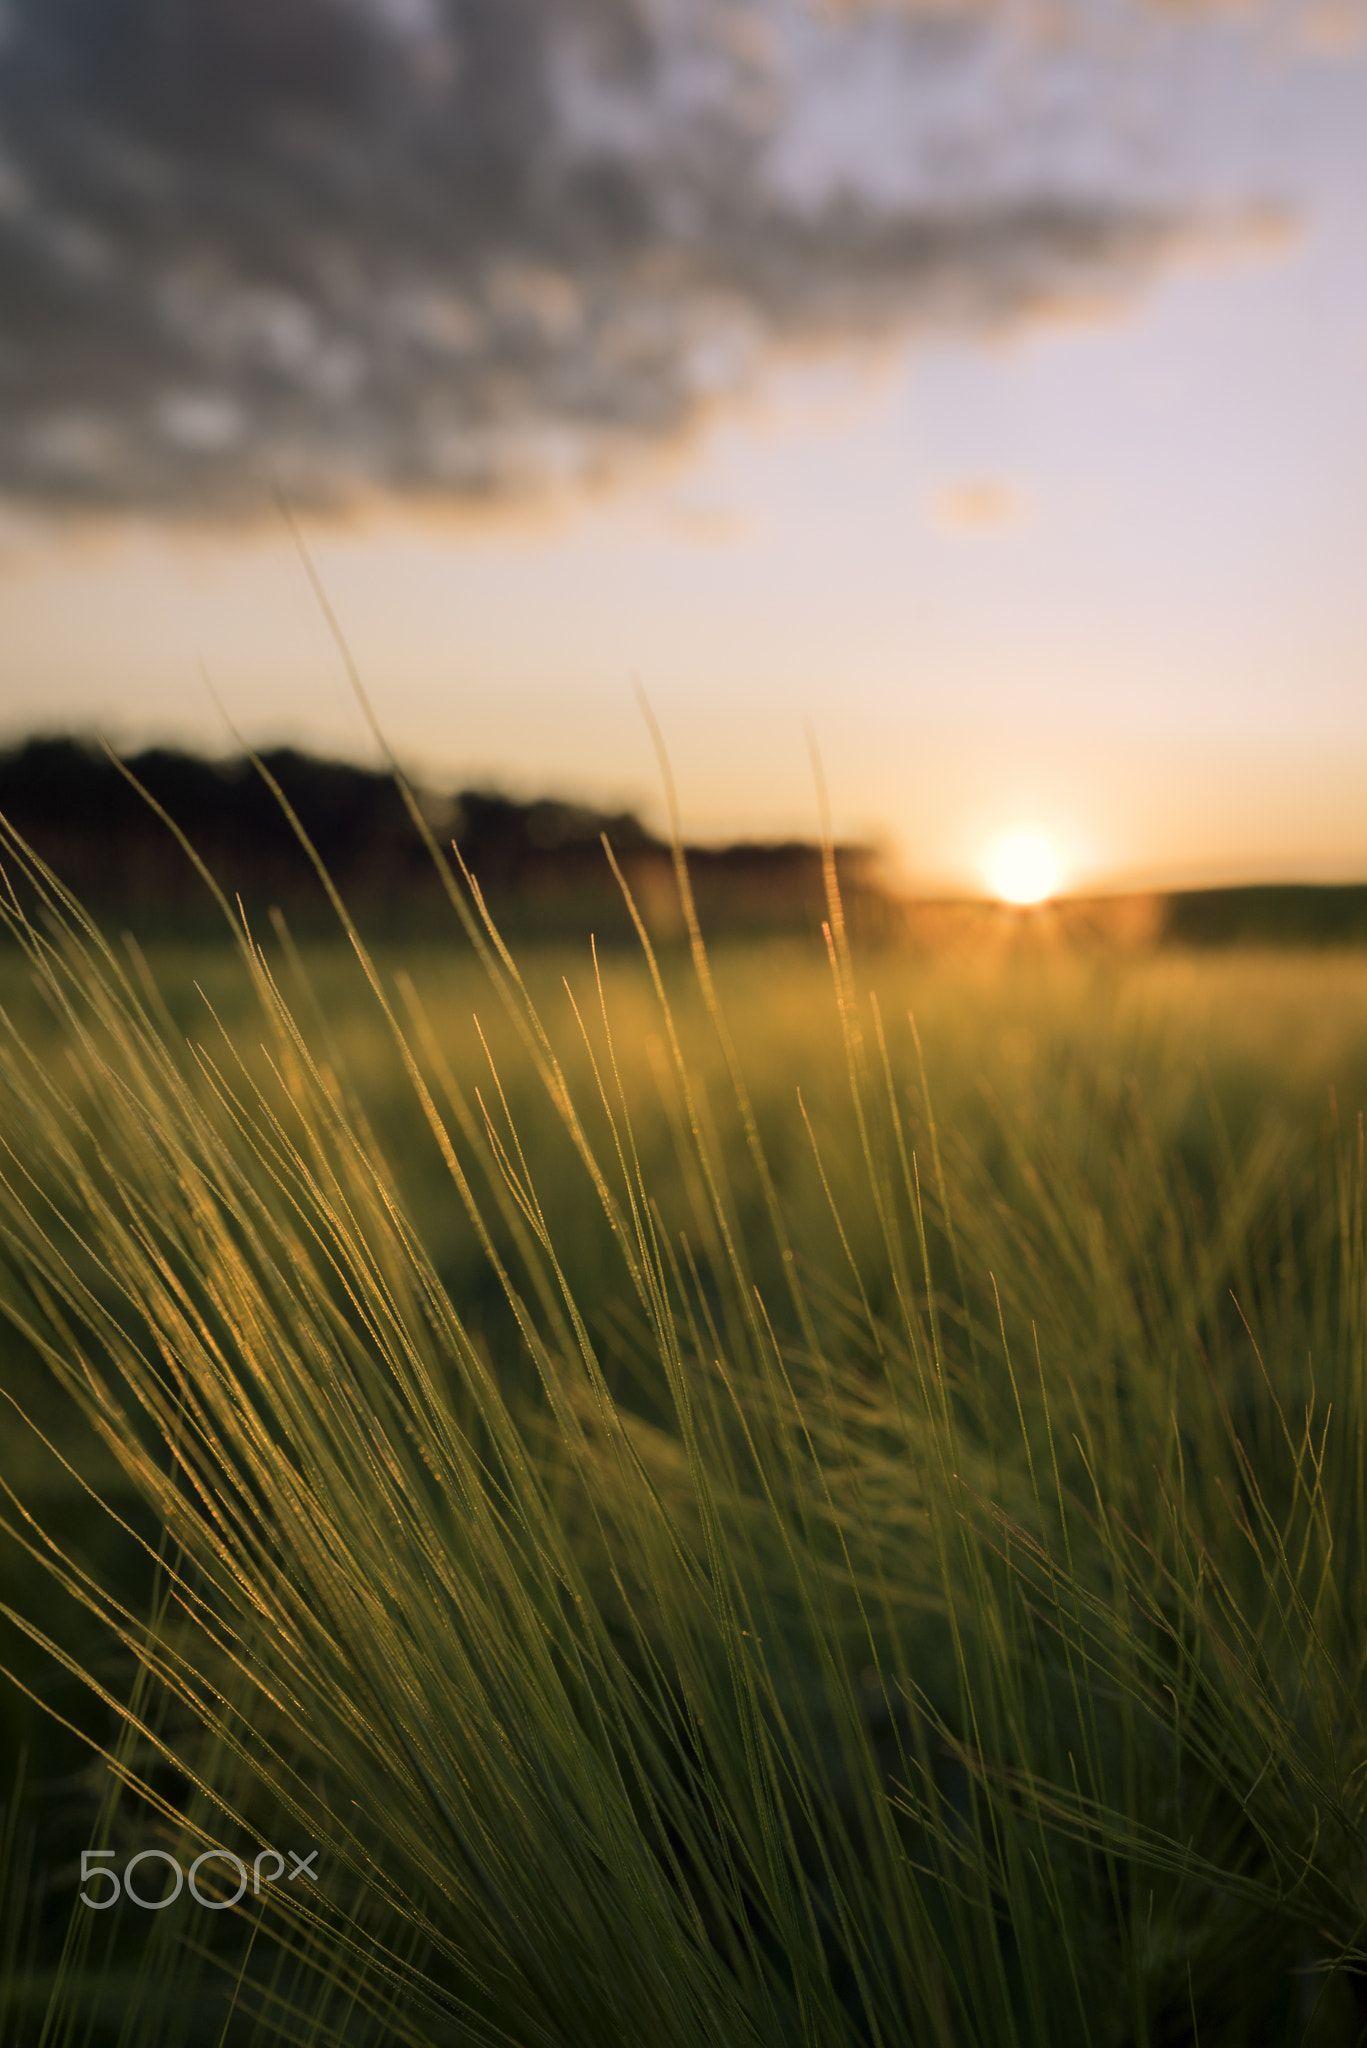 Golden Wheat   Agrarian field in the summer evening Atardecer 1367x2048